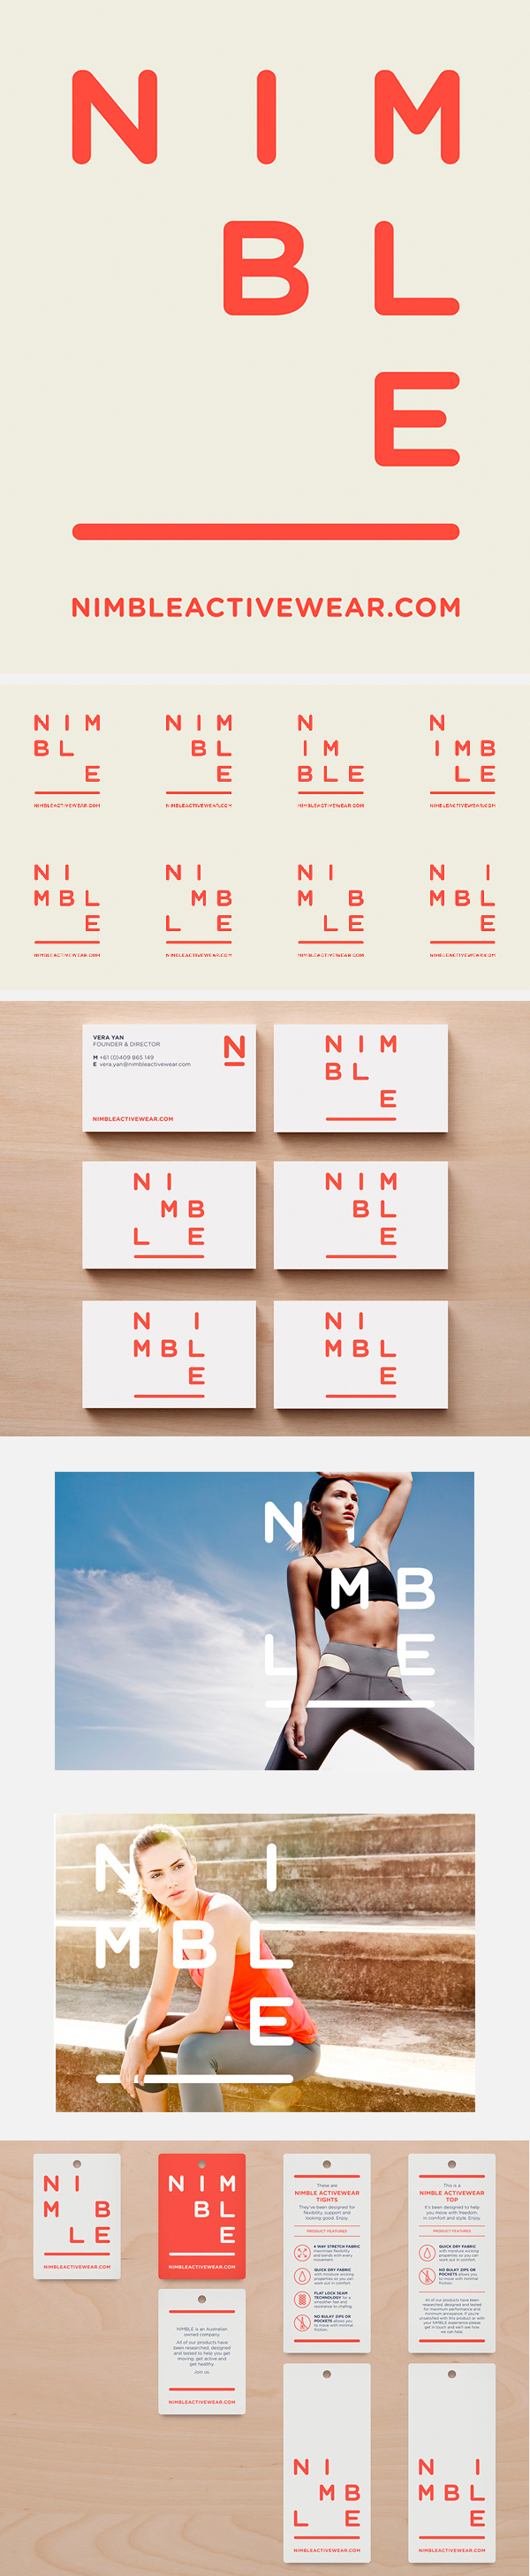 Nimble activewear brand ID